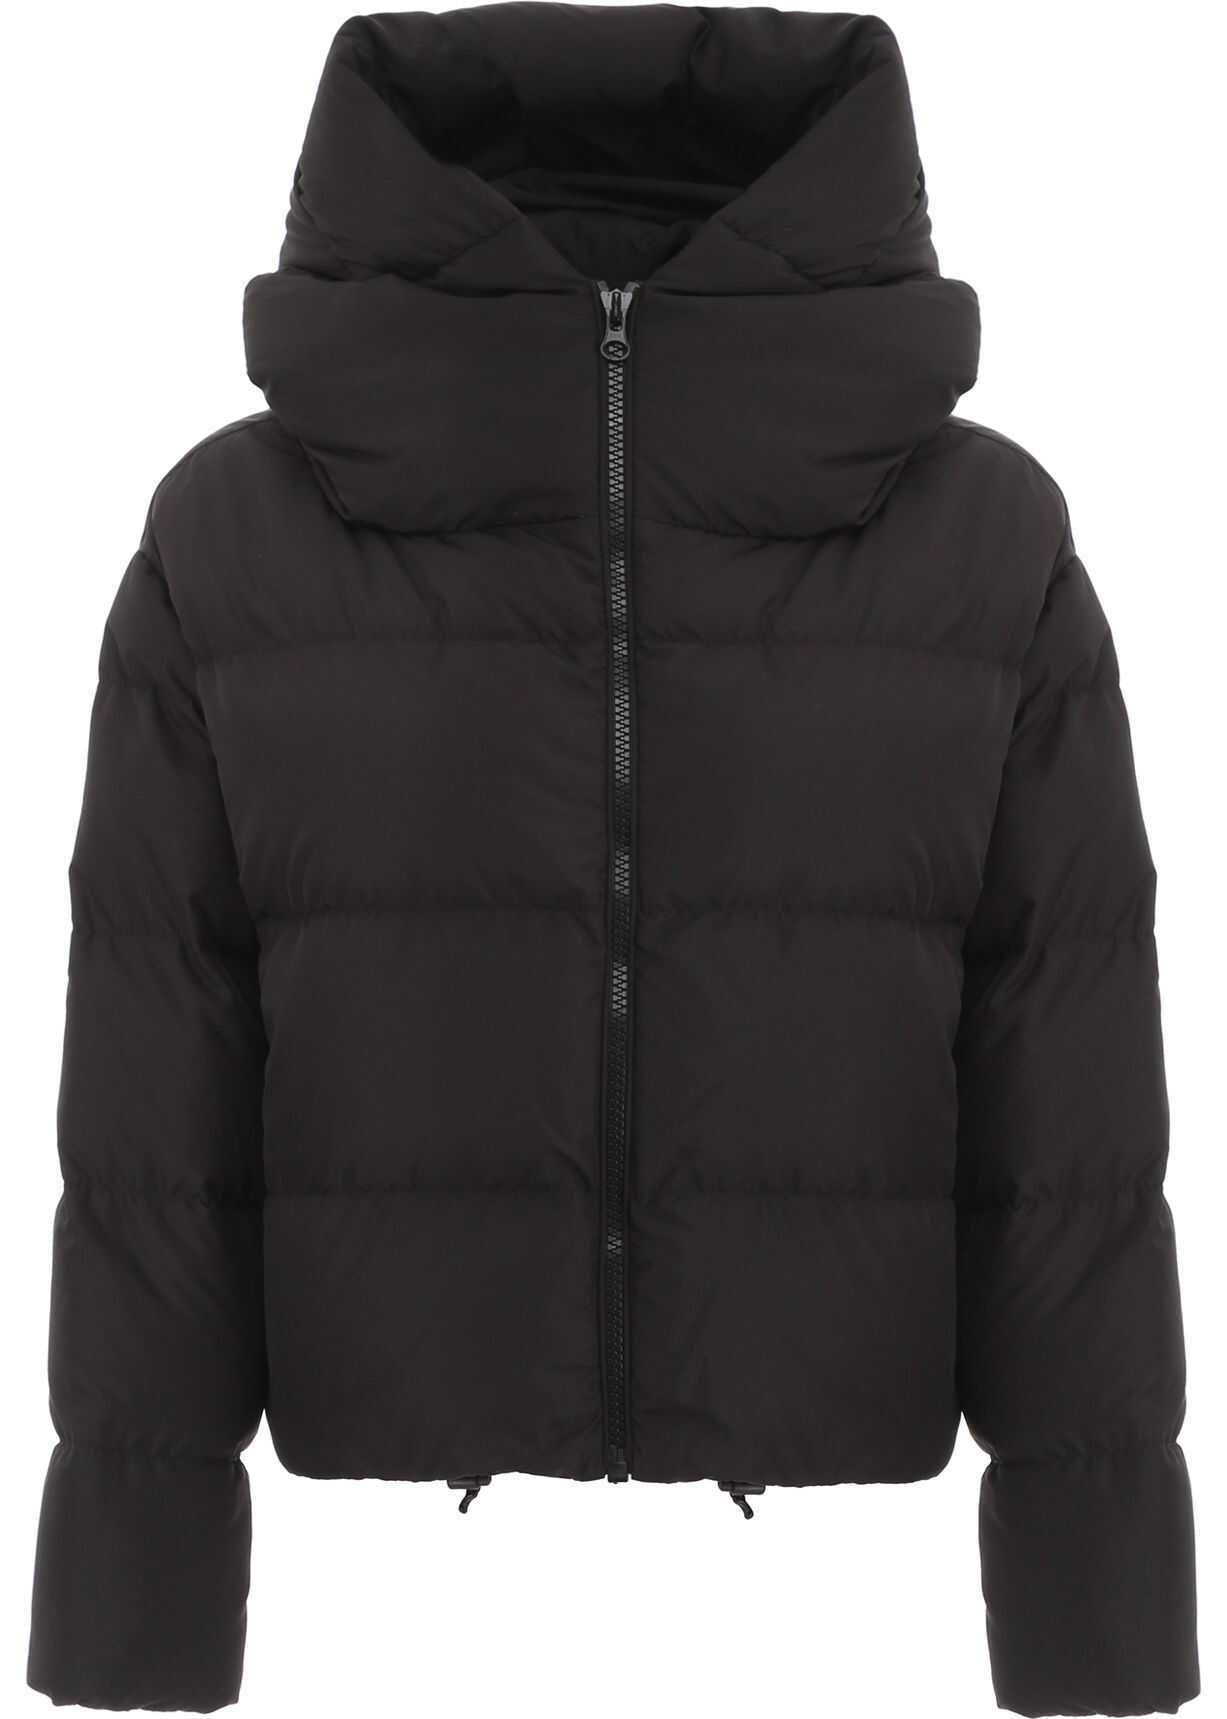 Bacon Cloud Jacket BLACK